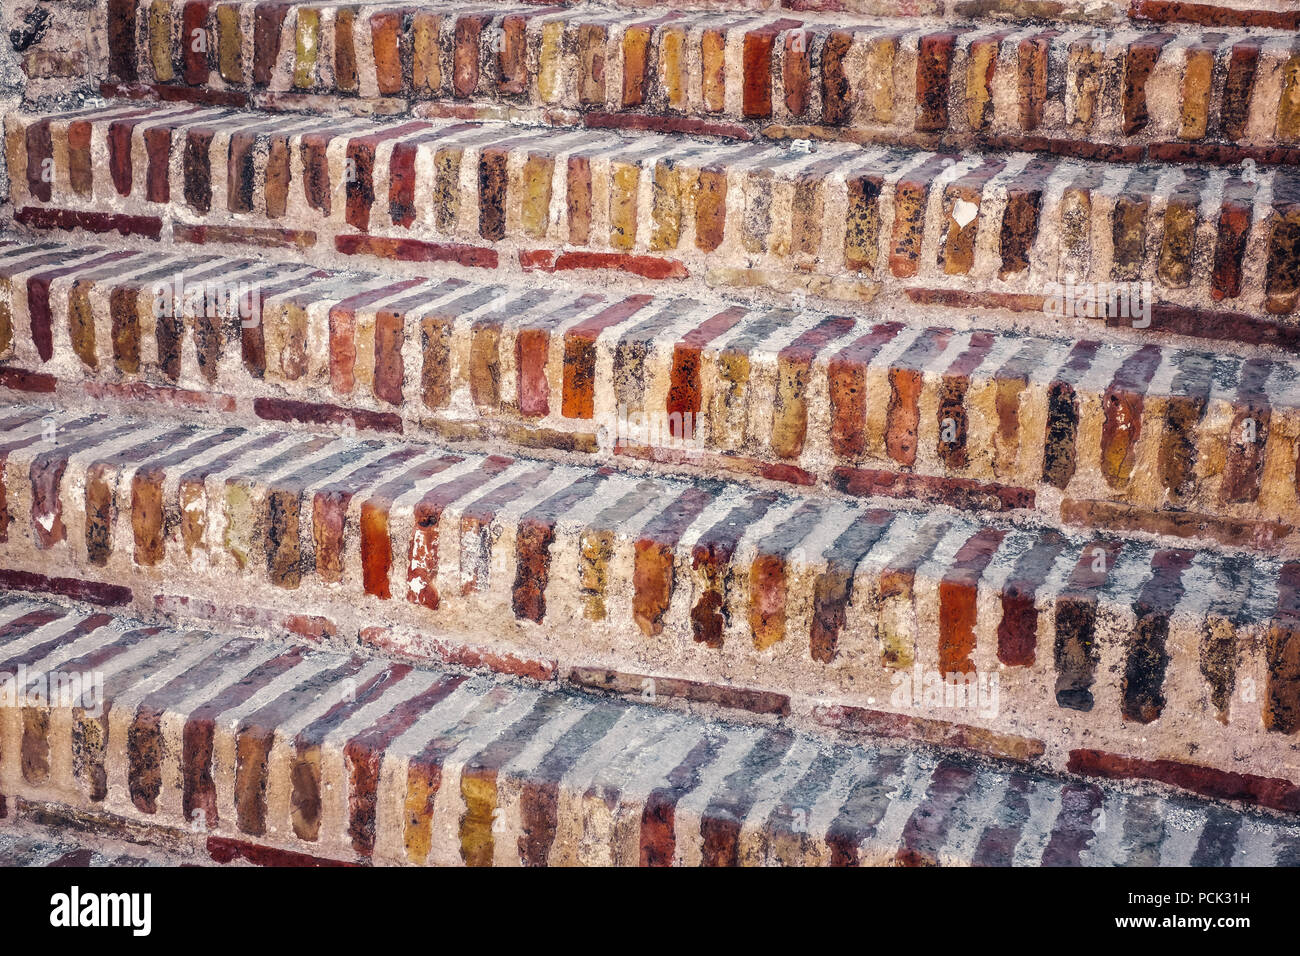 Steps of red old bricks - Stock Image